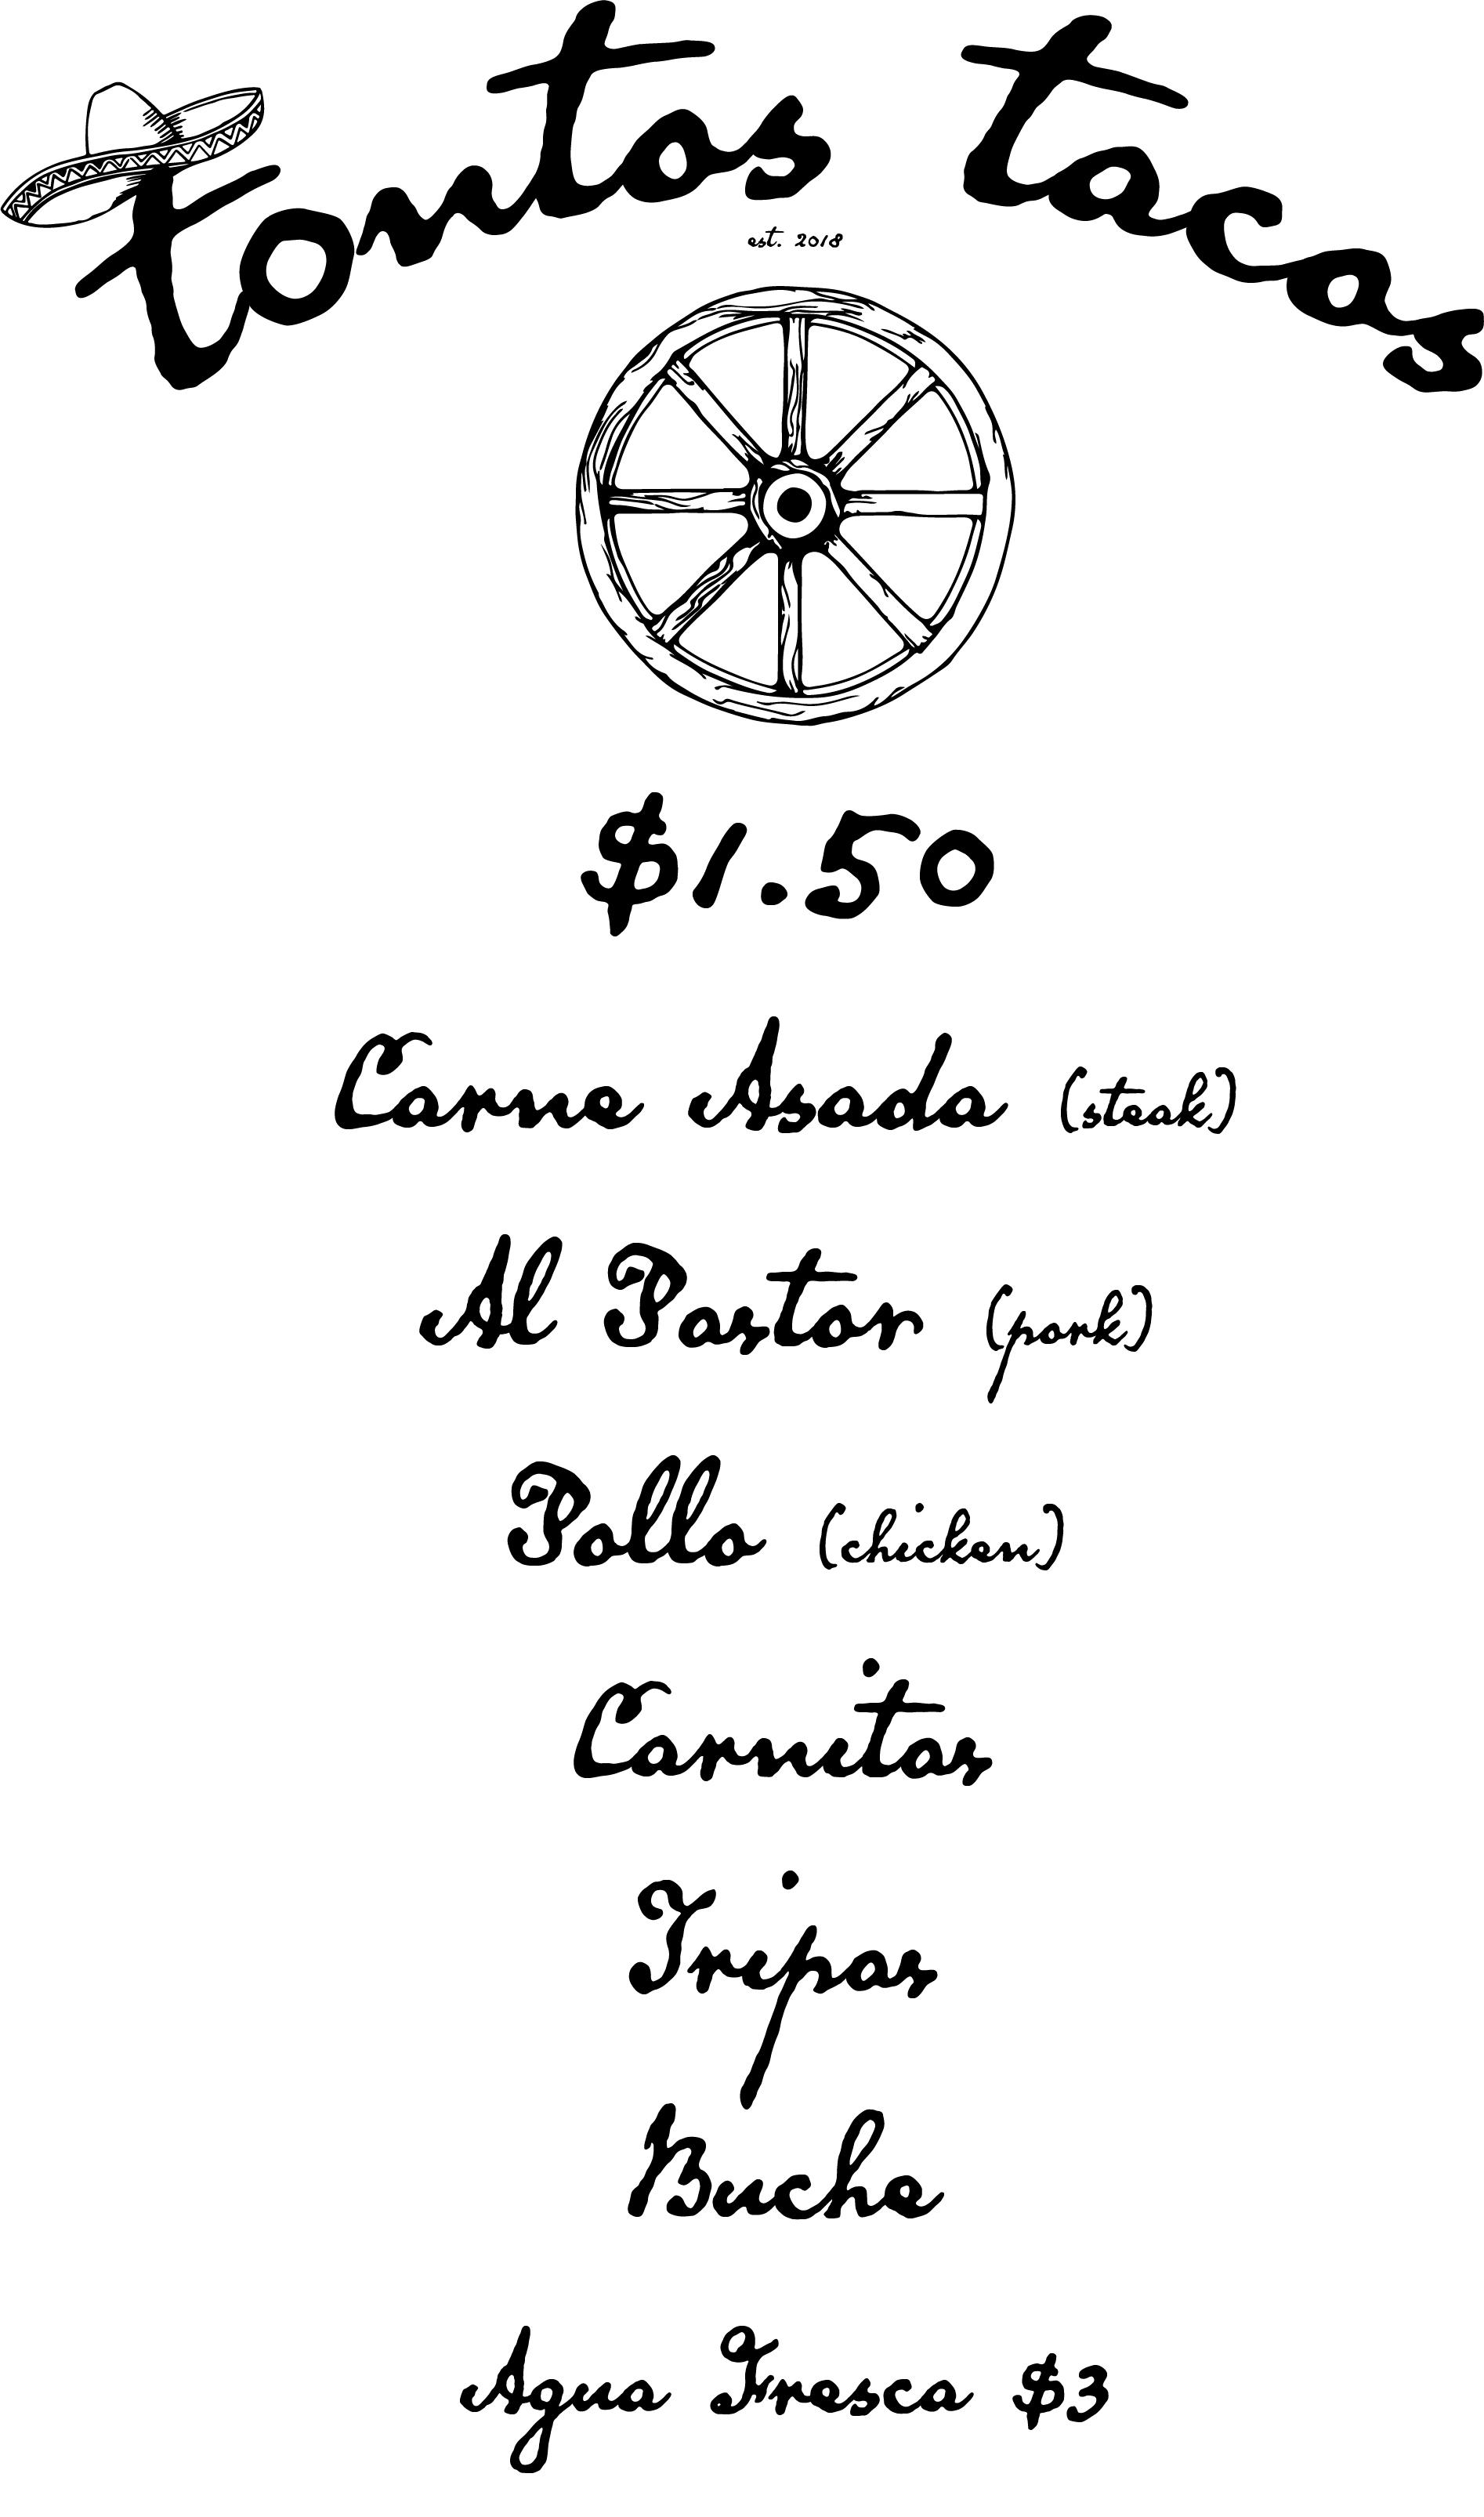 Tontos_menu.jpg